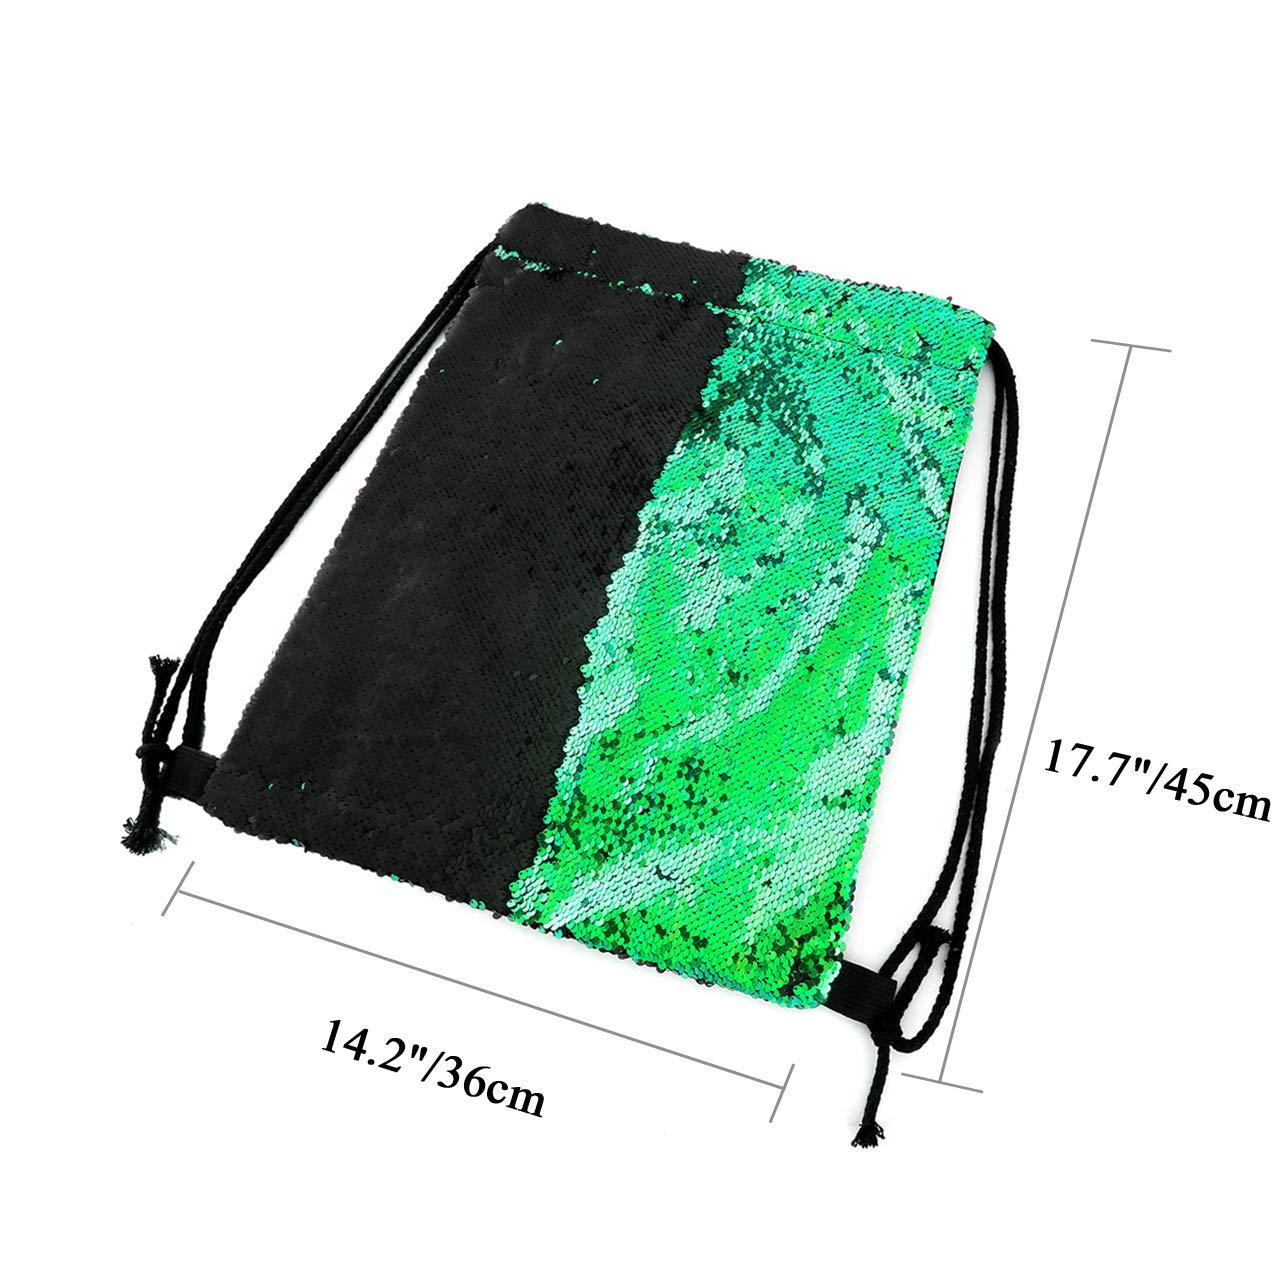 87be21cec494 Ayliss Sequin Cinch Sack Drawstring Backpack Reversible Glitter Paillette  String Bag for Women/Men/Girls (Green&Black)